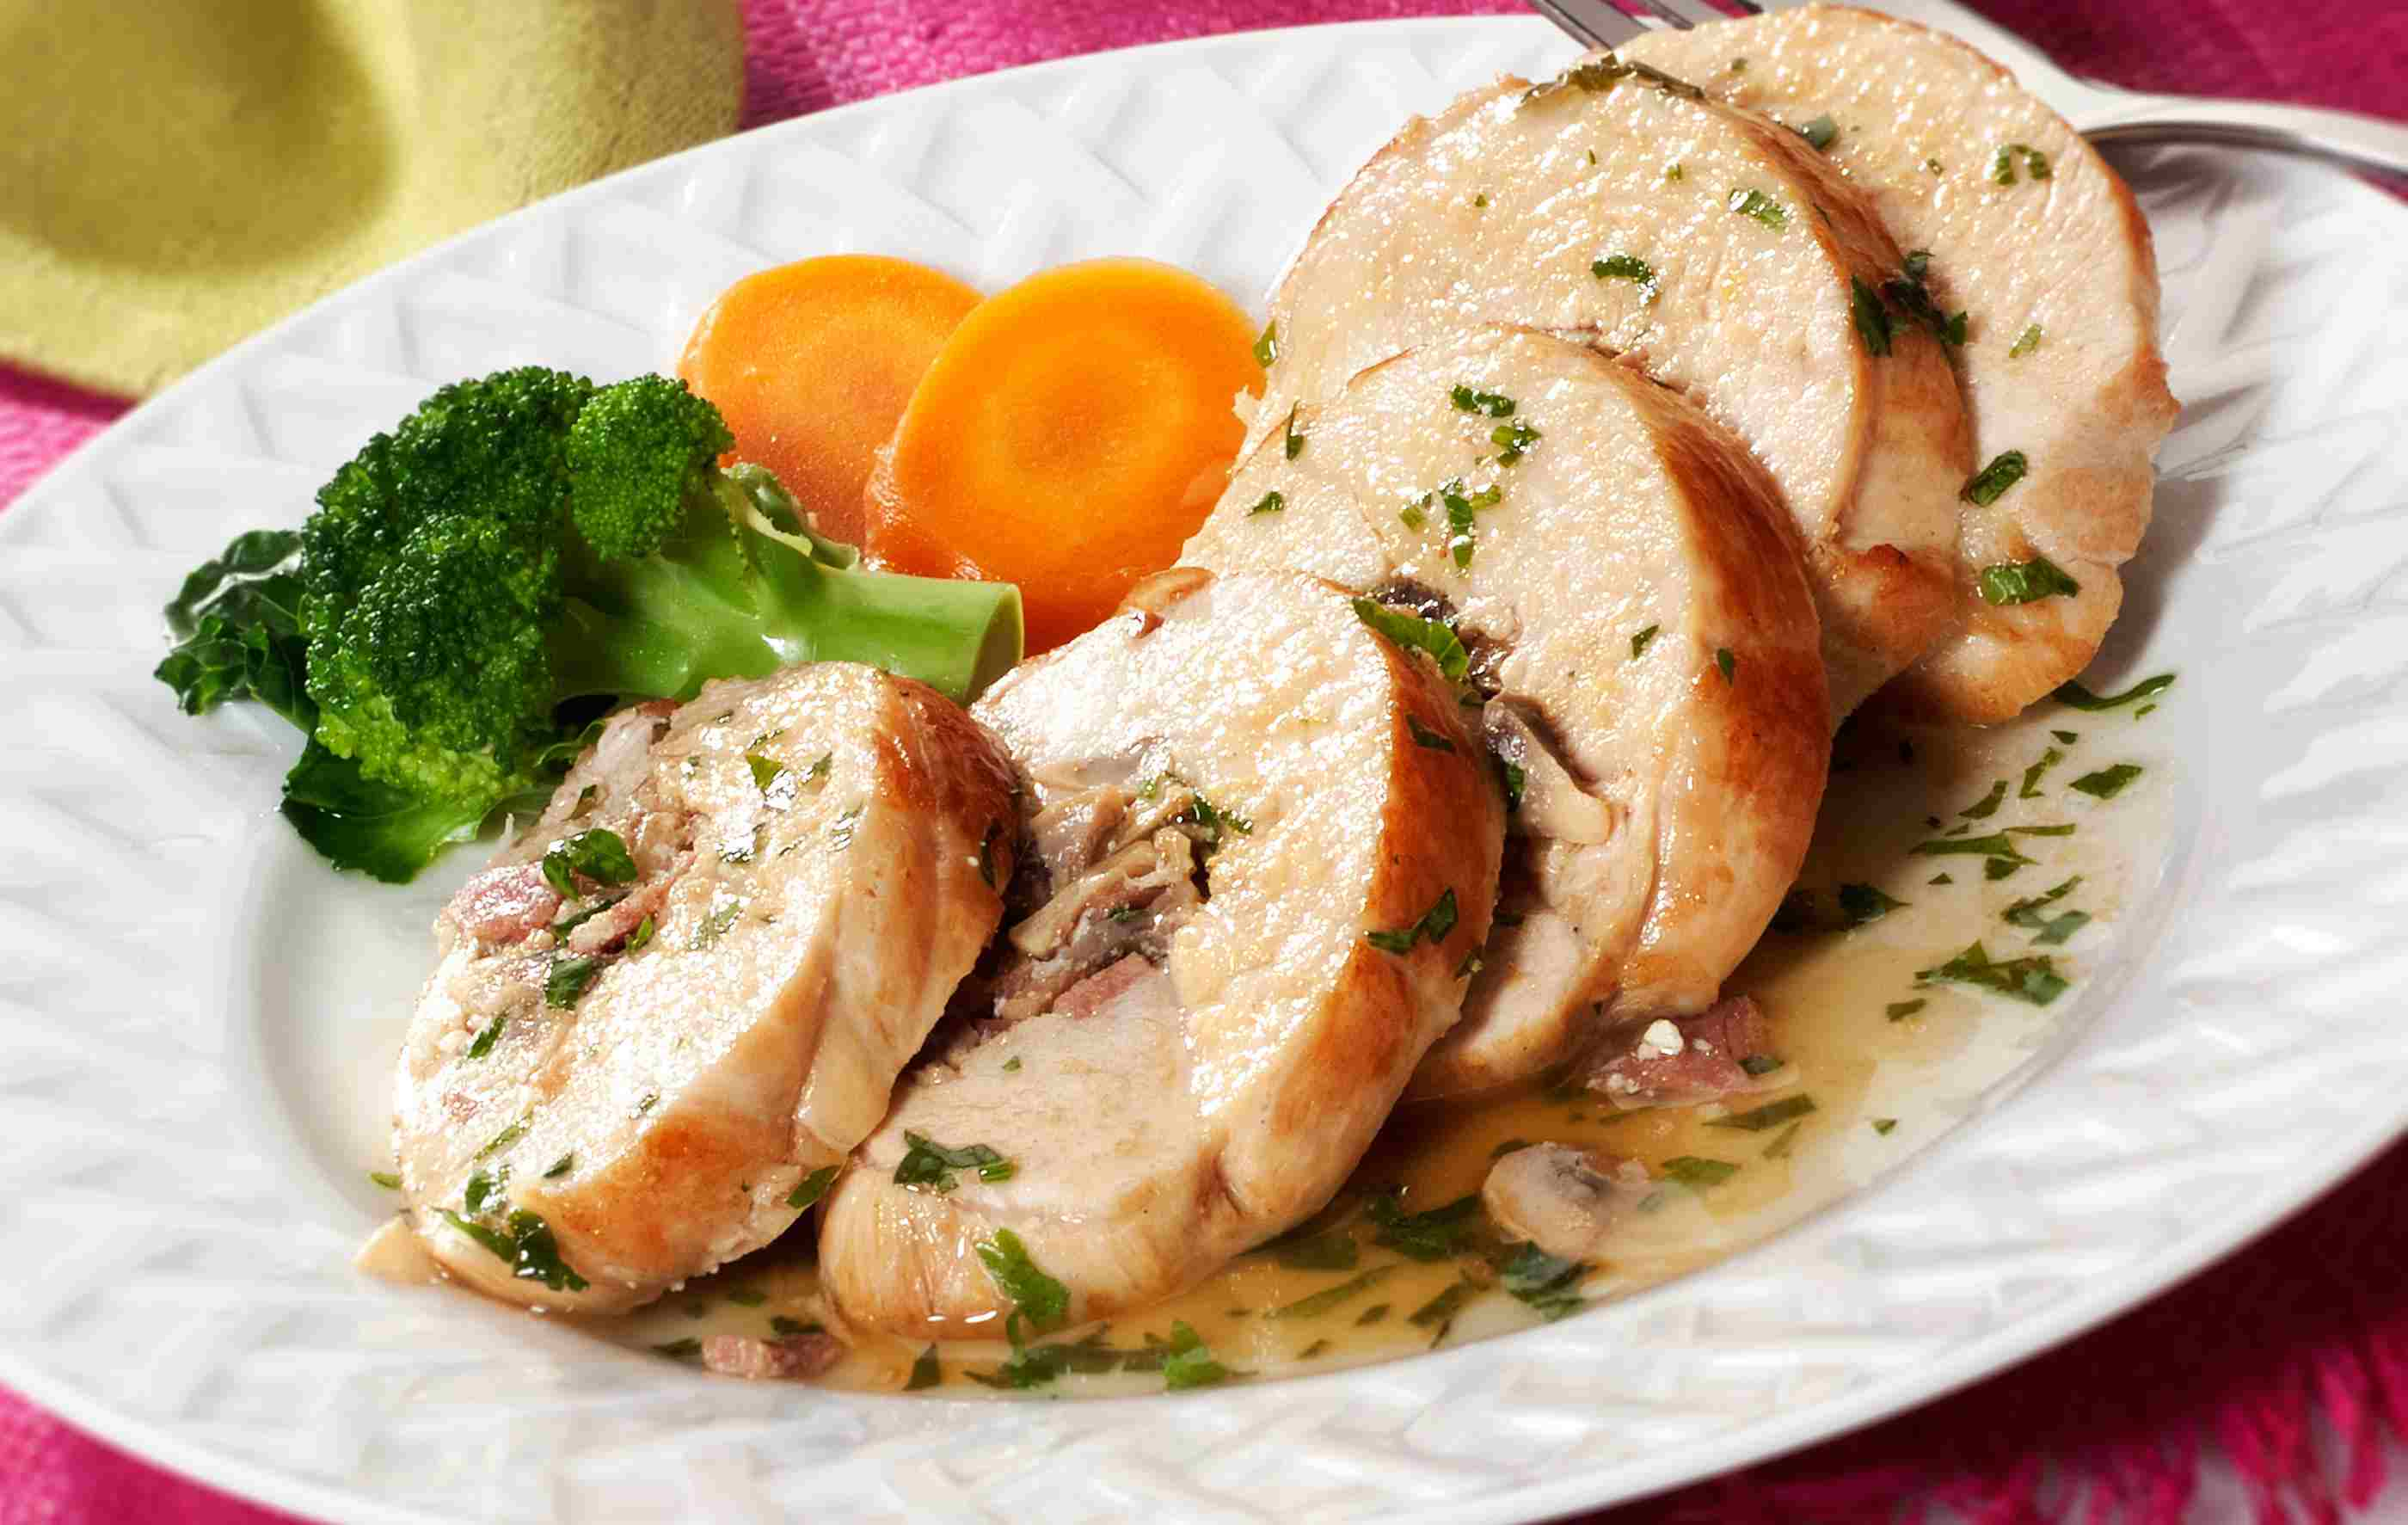 Stuffed chicken breasts with gravy